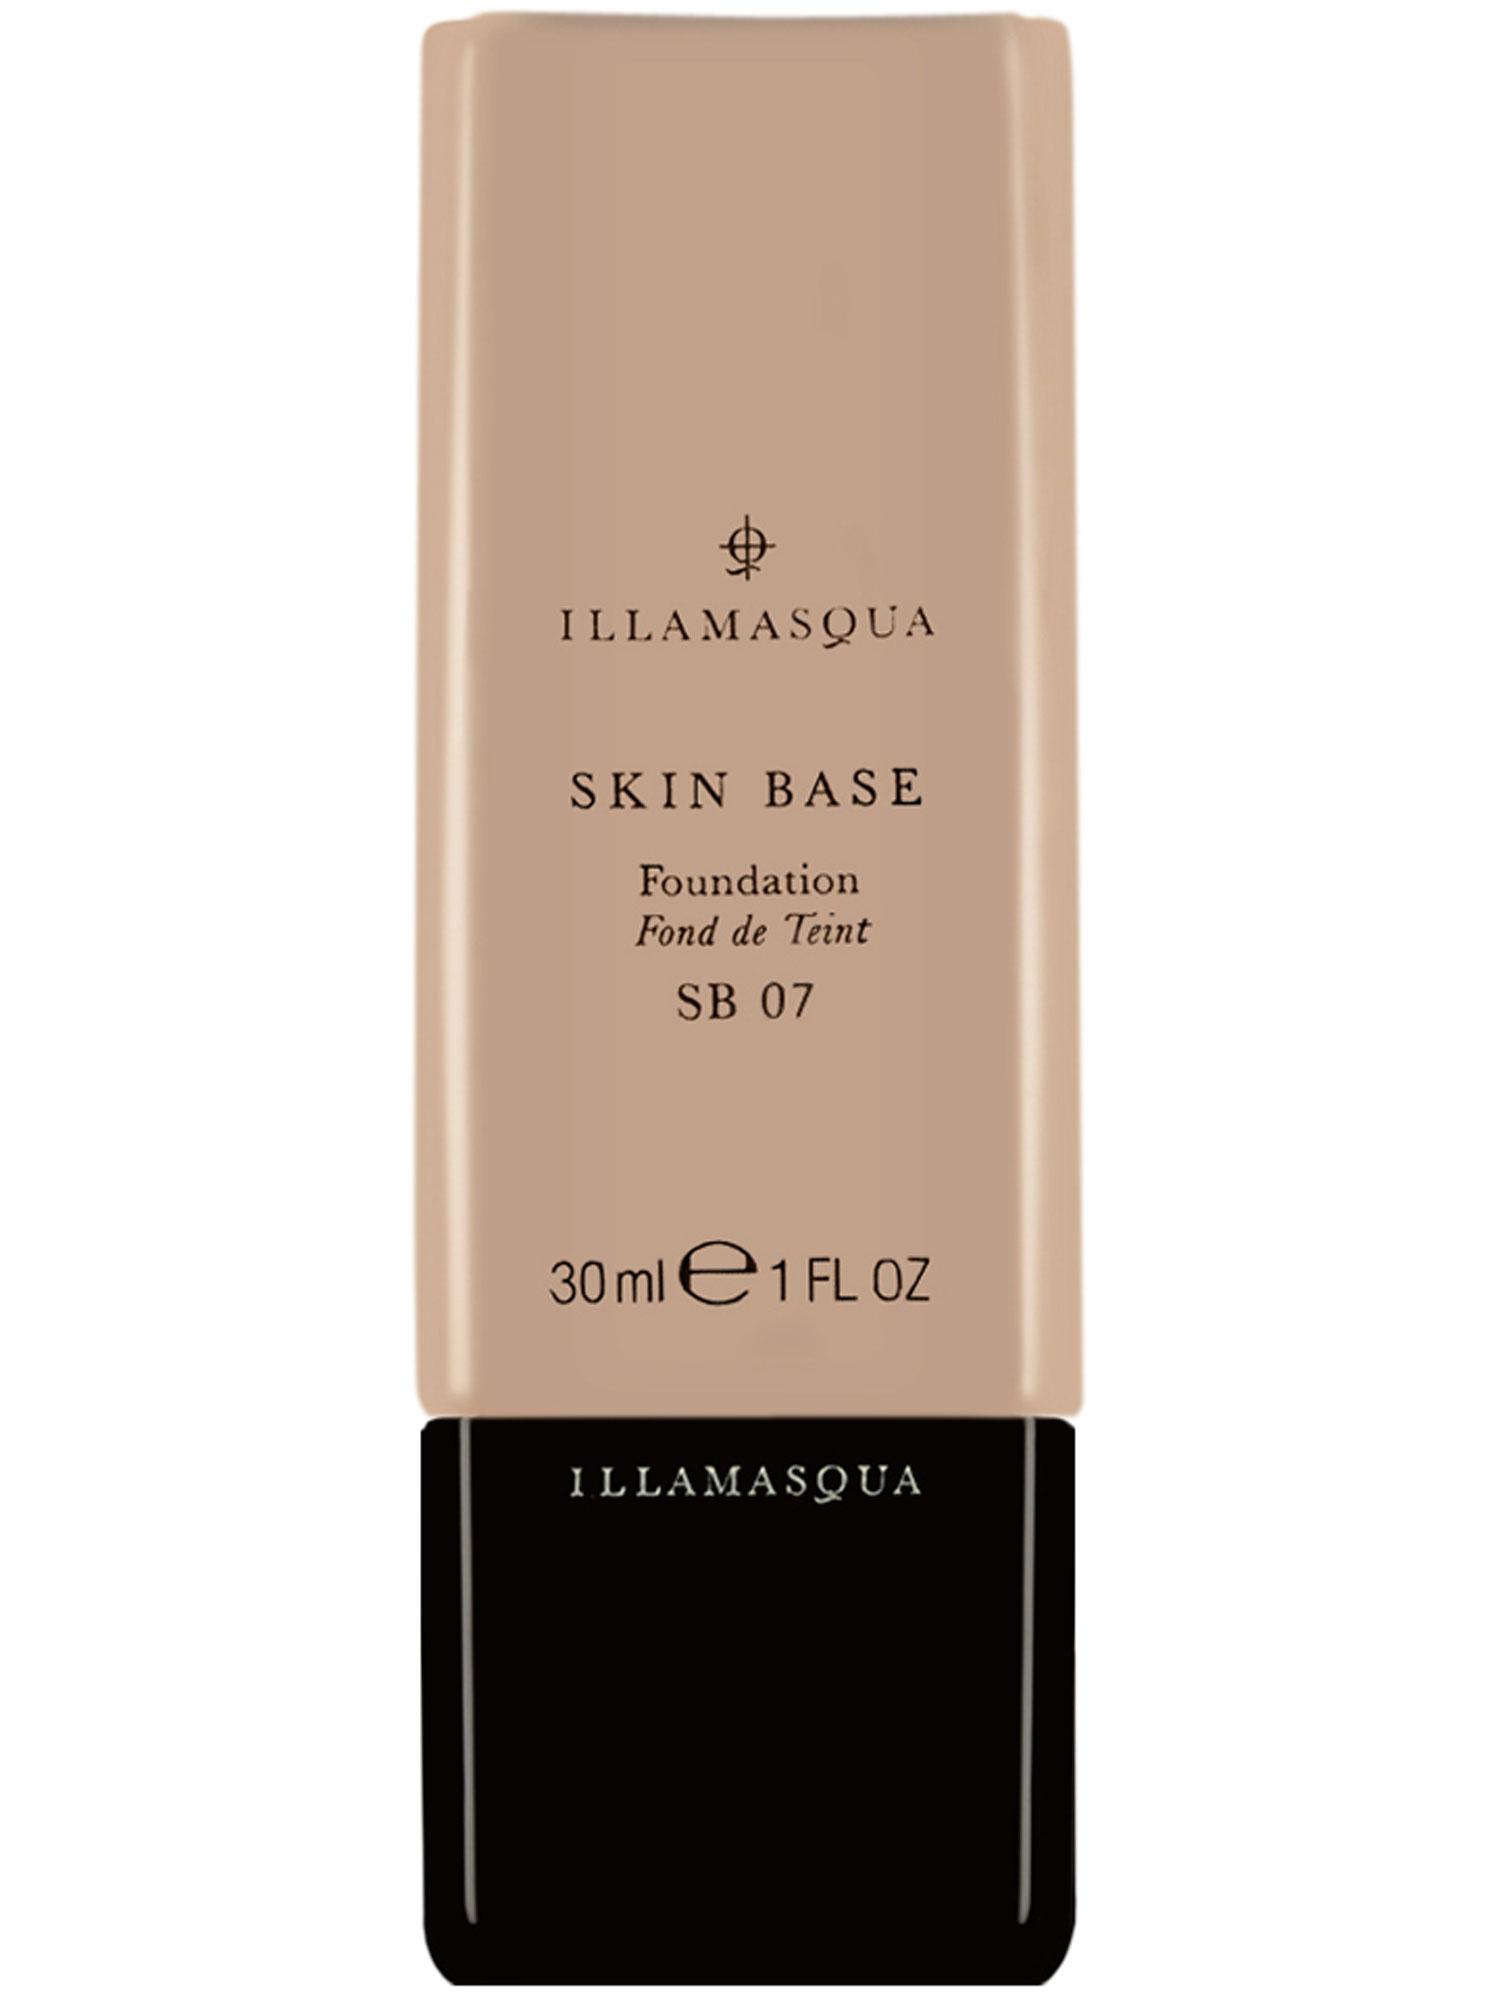 ILLAMASQUA-Skin-Base-Foundation-30-ml-1-FL-OZ-43-NEW thumbnail 7